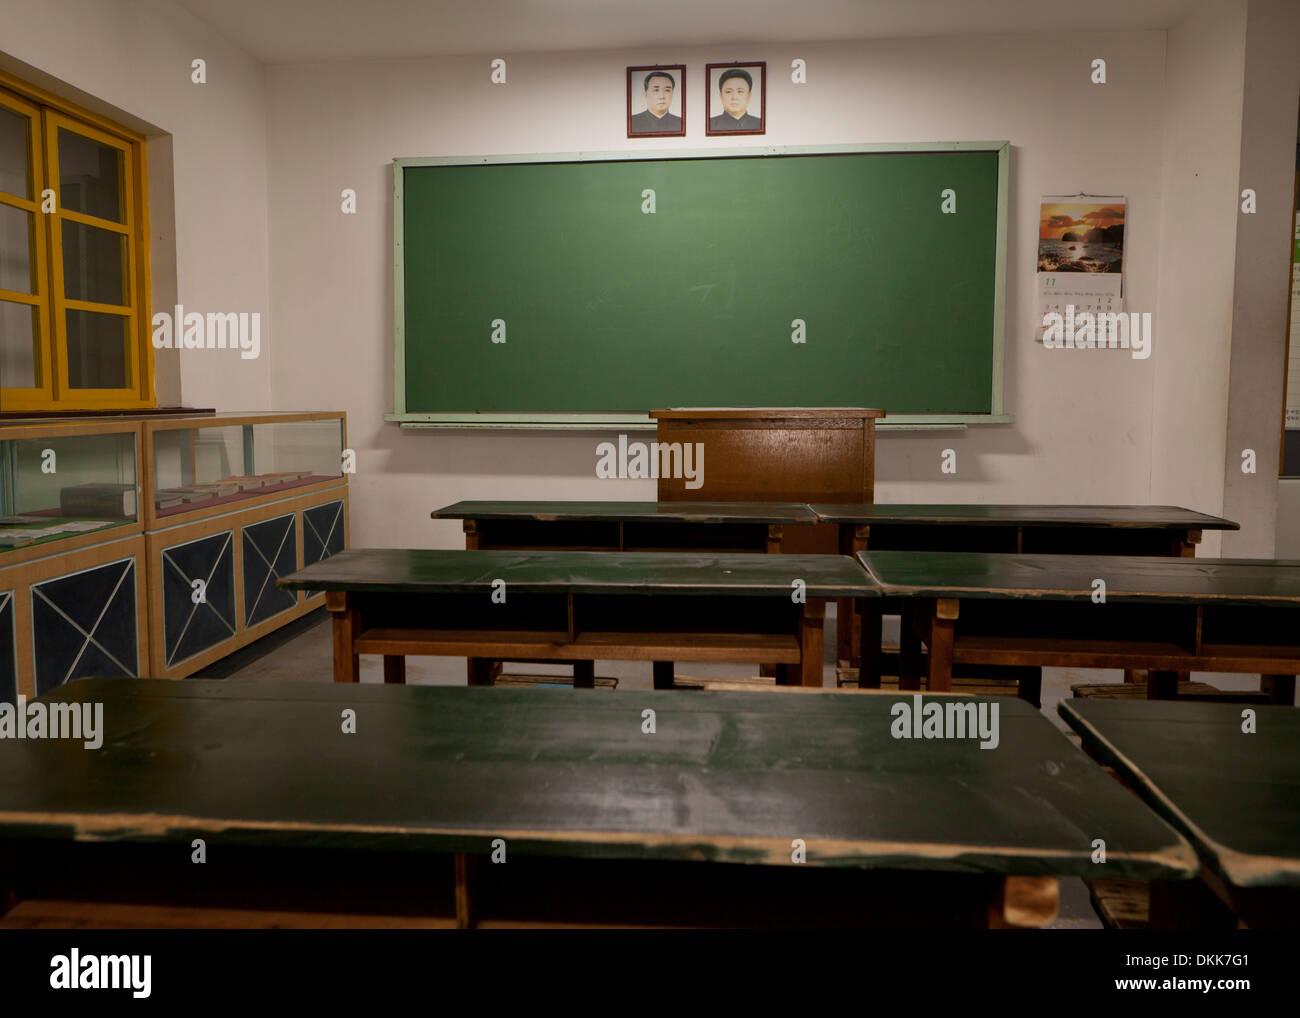 Mock-up of North Korean school classroom displaying portraits of Kim Il Sung and Kim Jong Il above blackboard - Stock Image